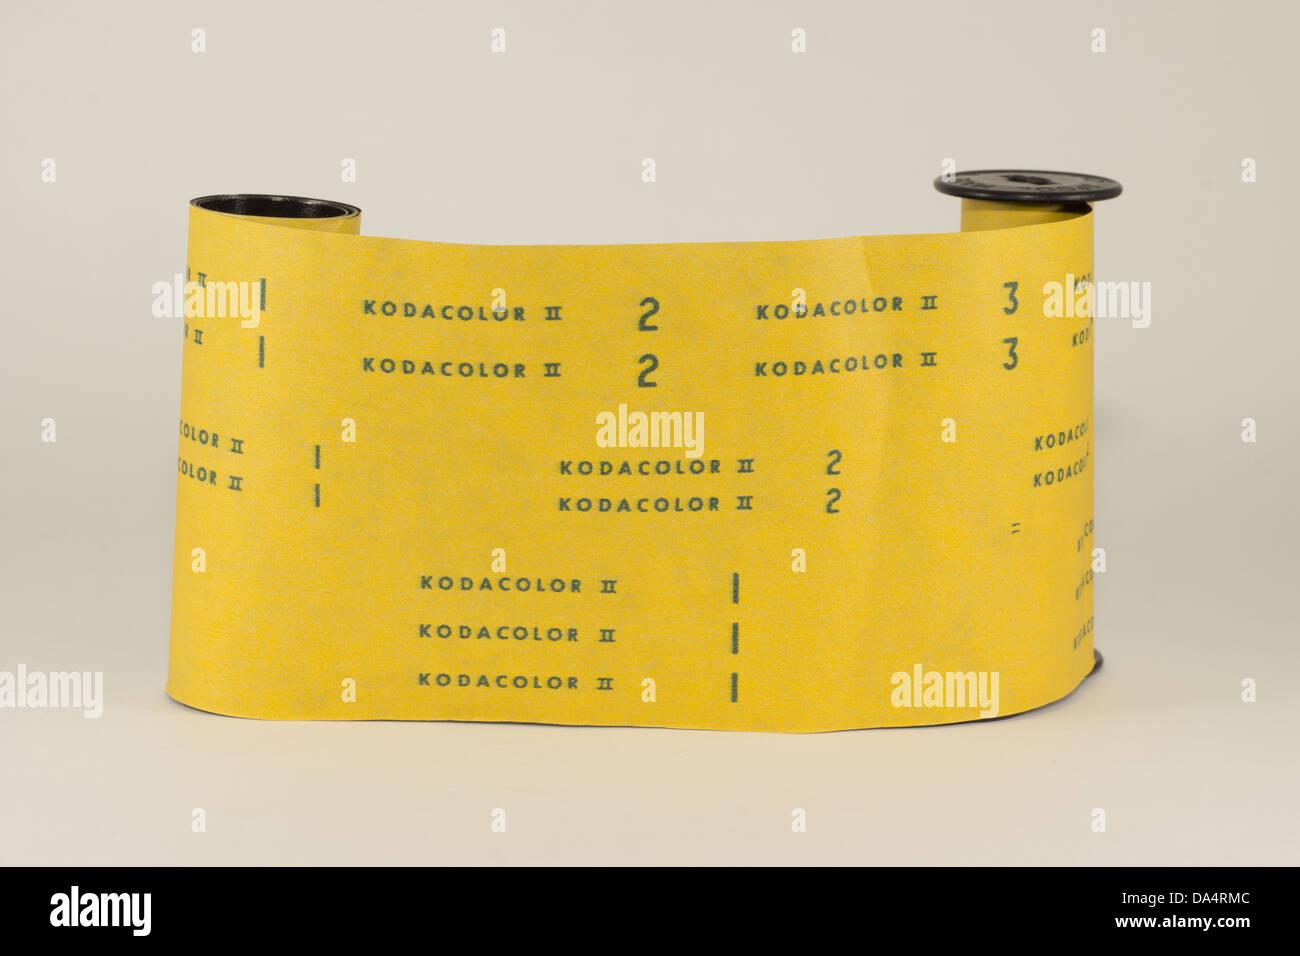 A roll of Kodak Kodacolor II 120 medium format film Stock Photo